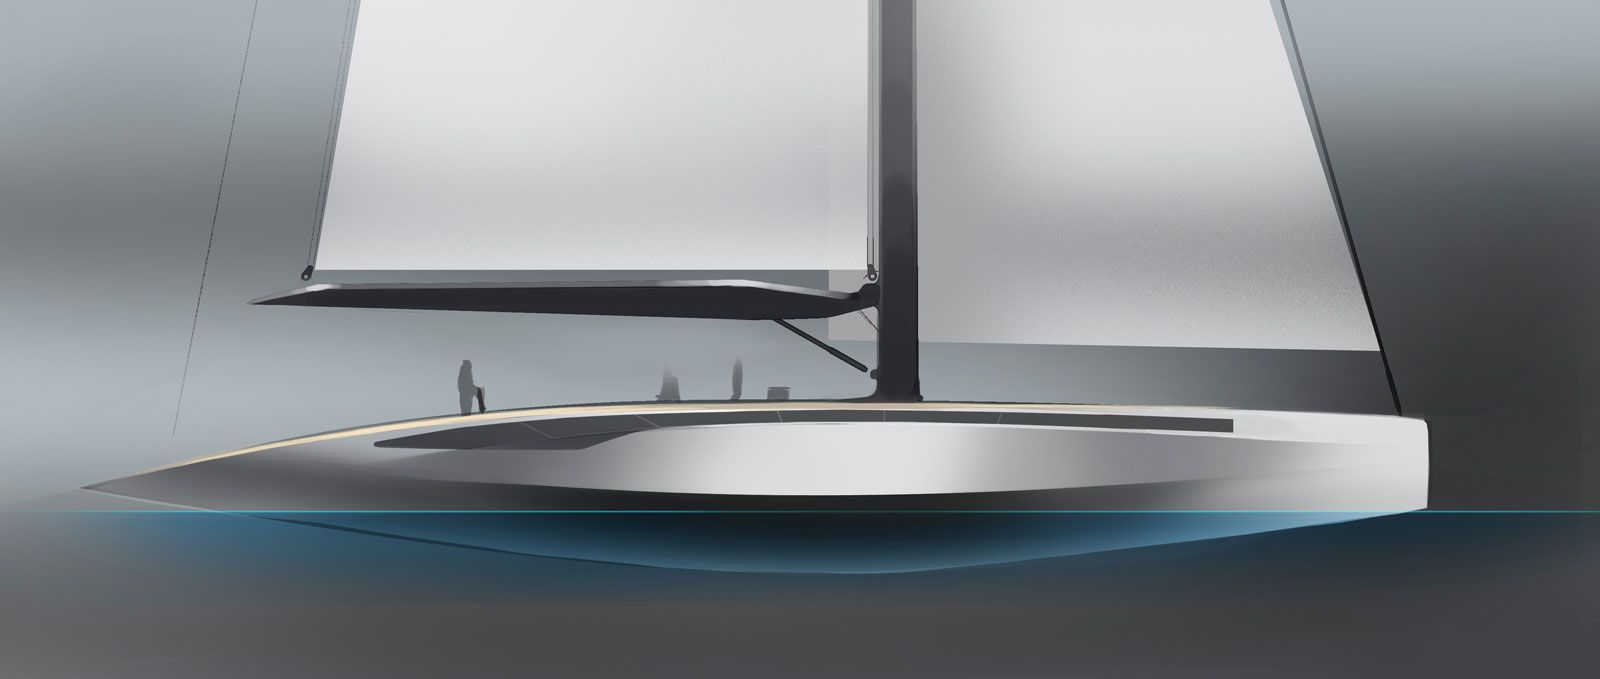 Peugeot Concept Sailboat | sketches | Pinterest | Sailboats, Cars ...